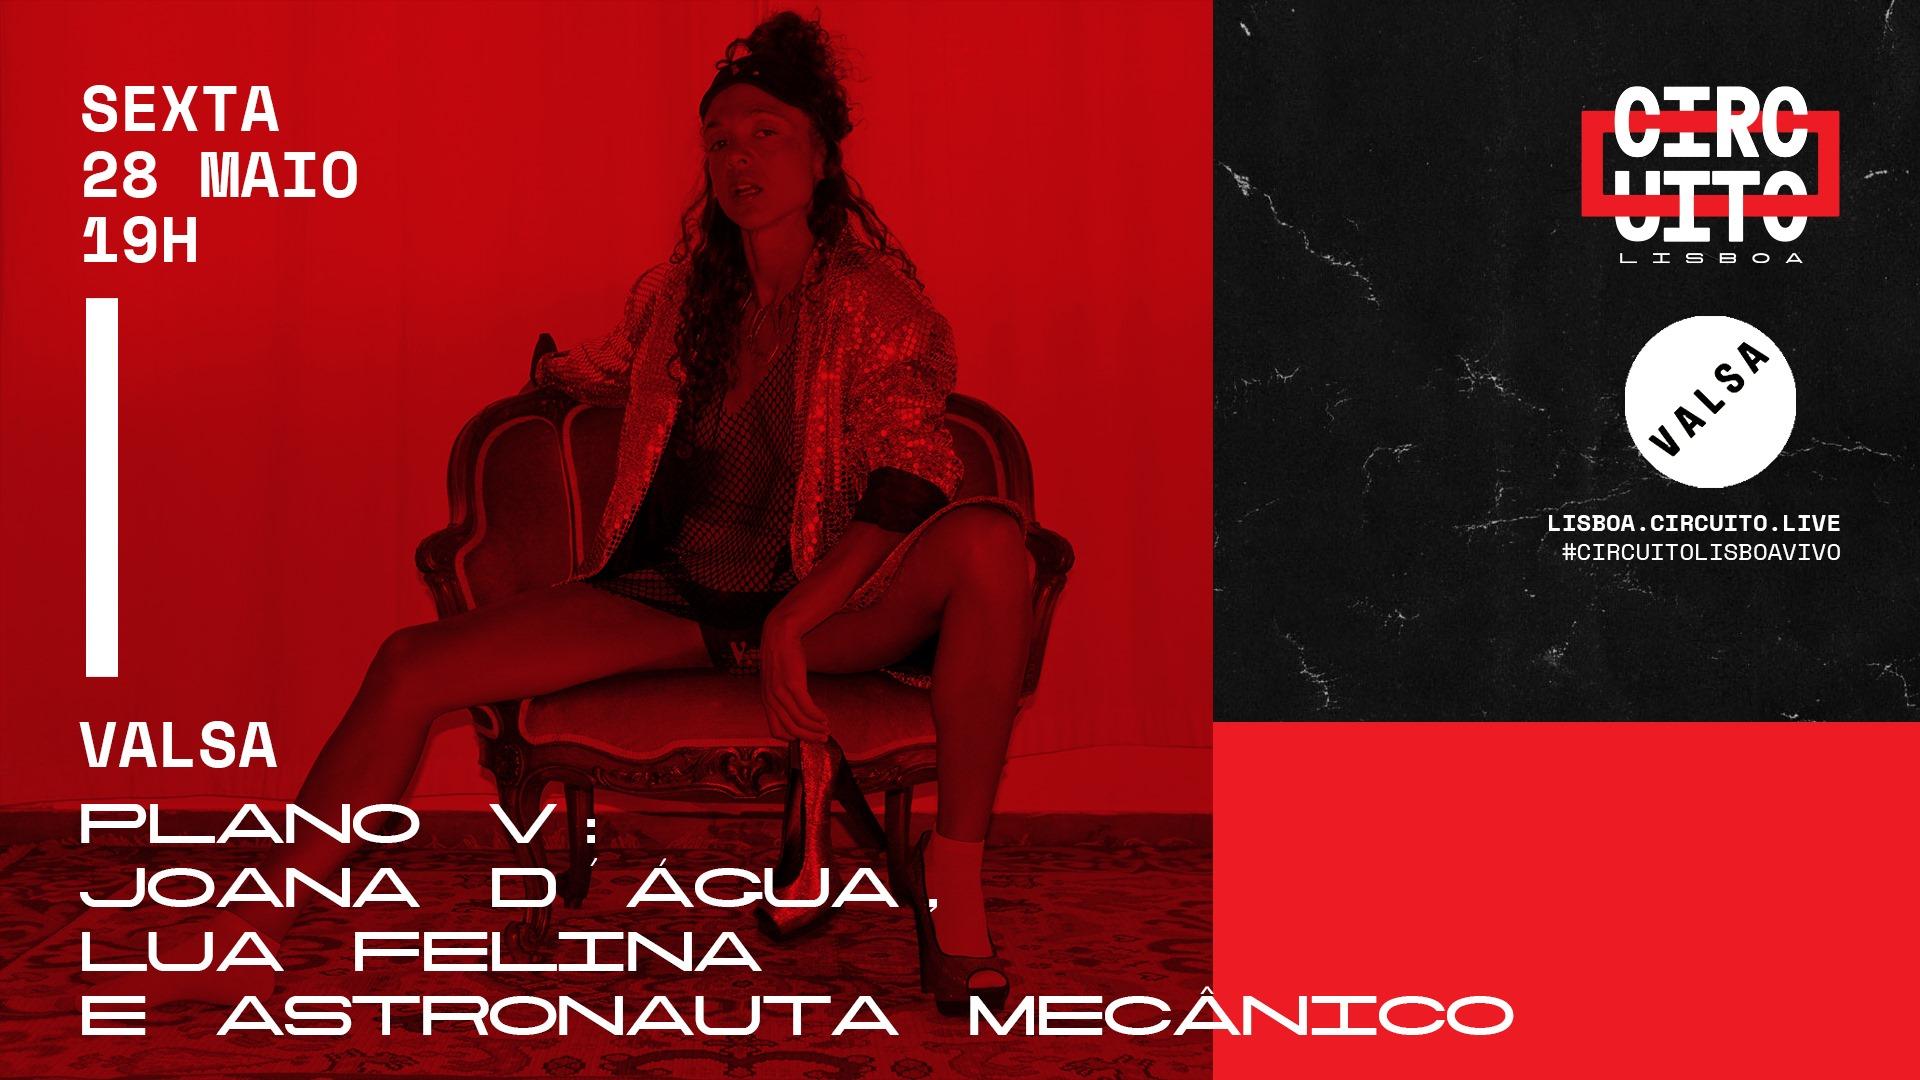 PLANO V | JOANA D'AGUA, LUA FELINA E ASTRONAUTA MECÂNICO